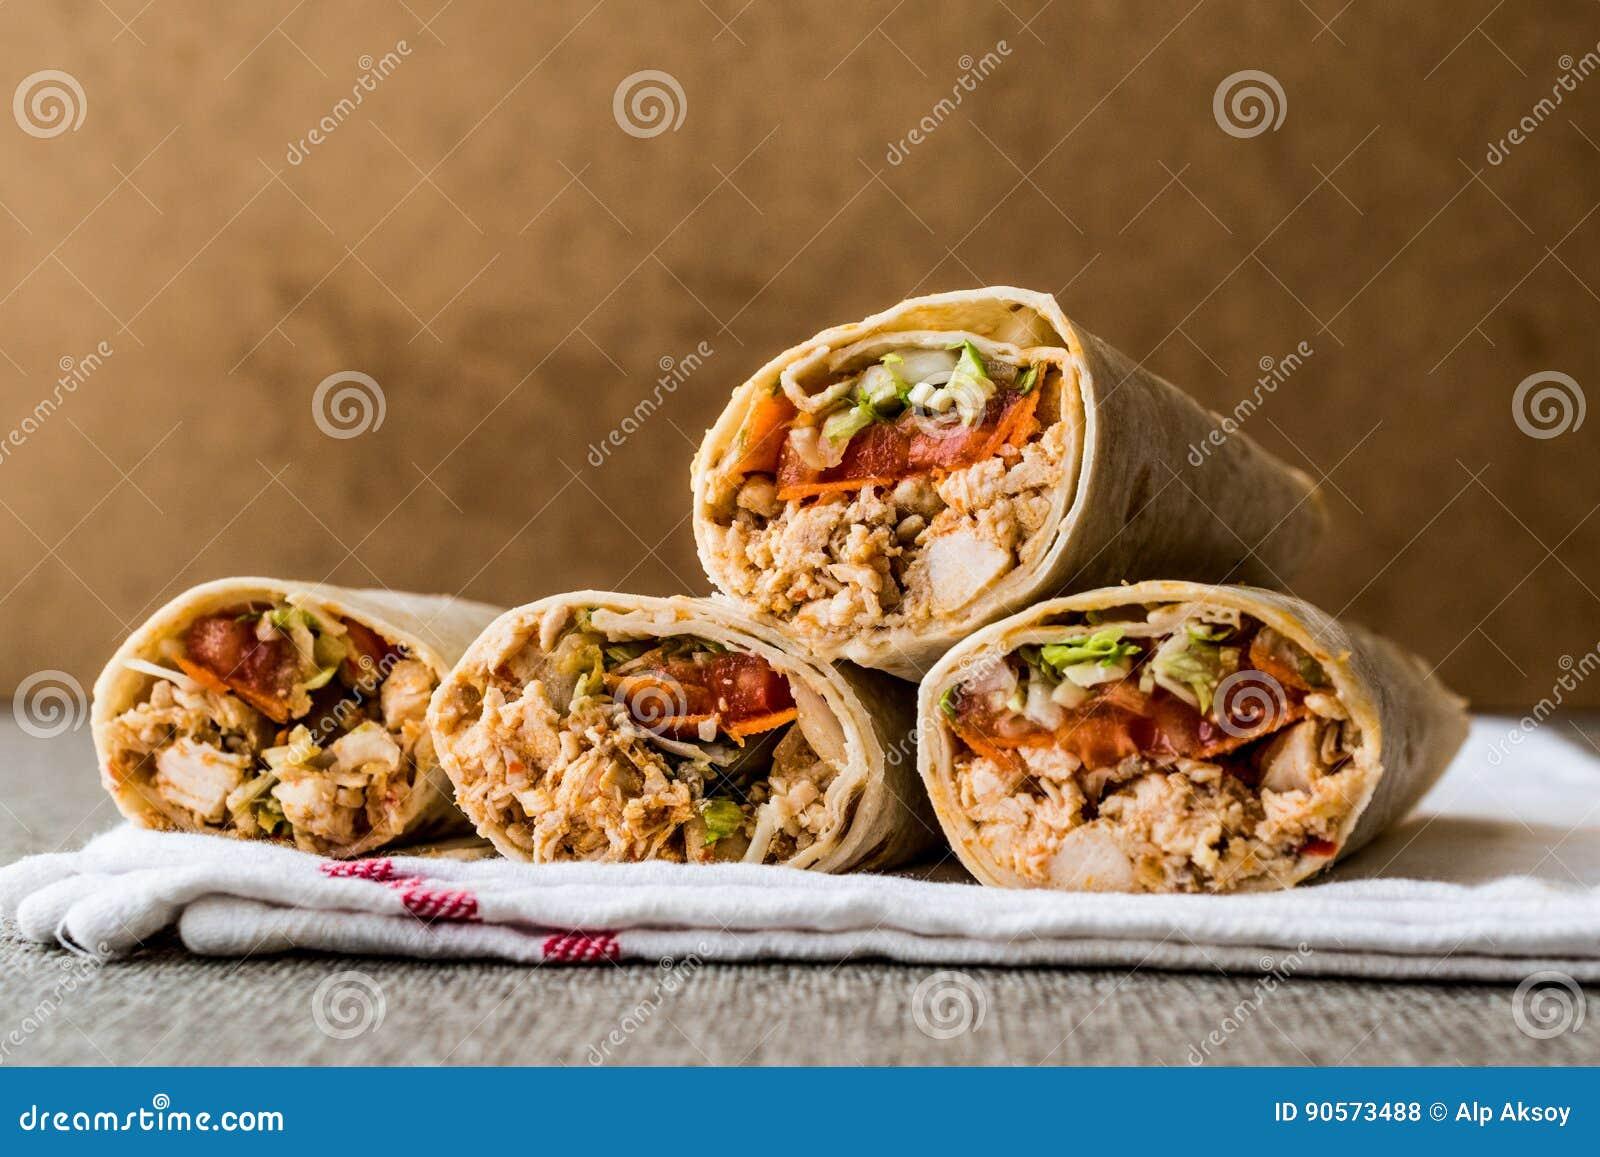 Chicken shawarma durum doner kebab copy space.